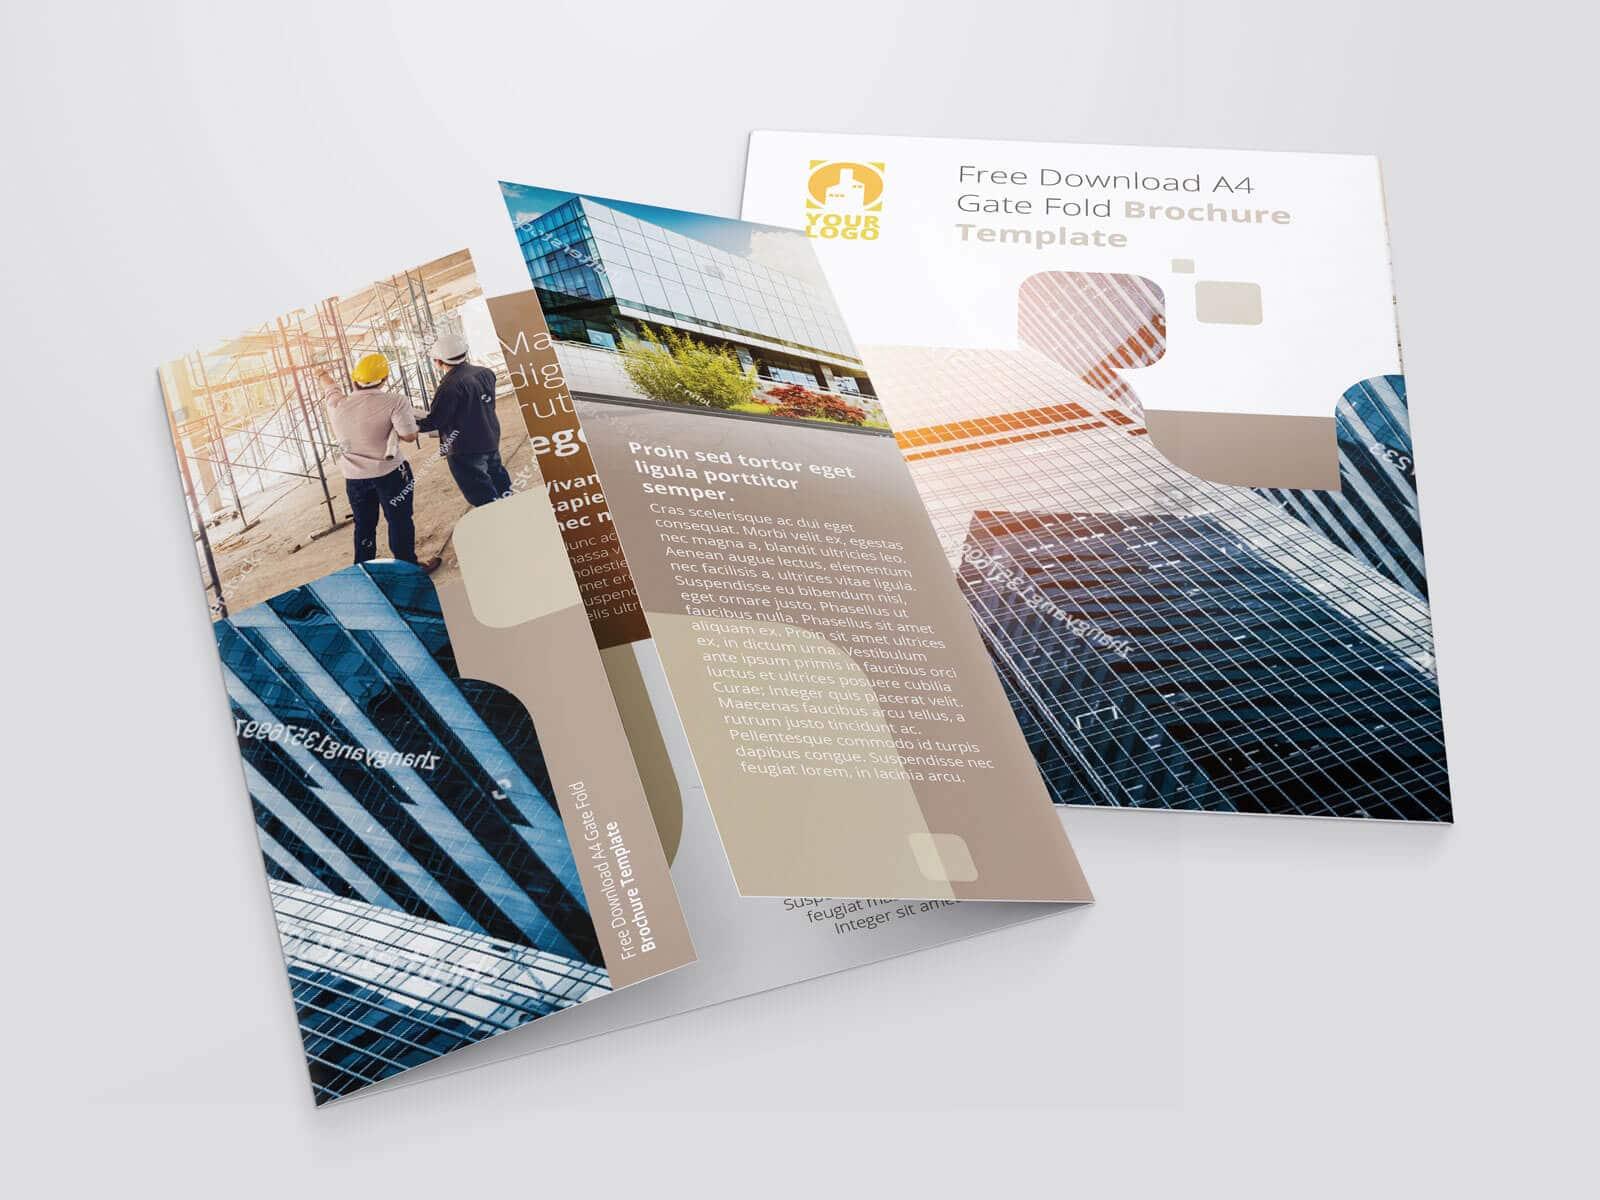 17 x 11 Gate Fold Brochure Mockup 01